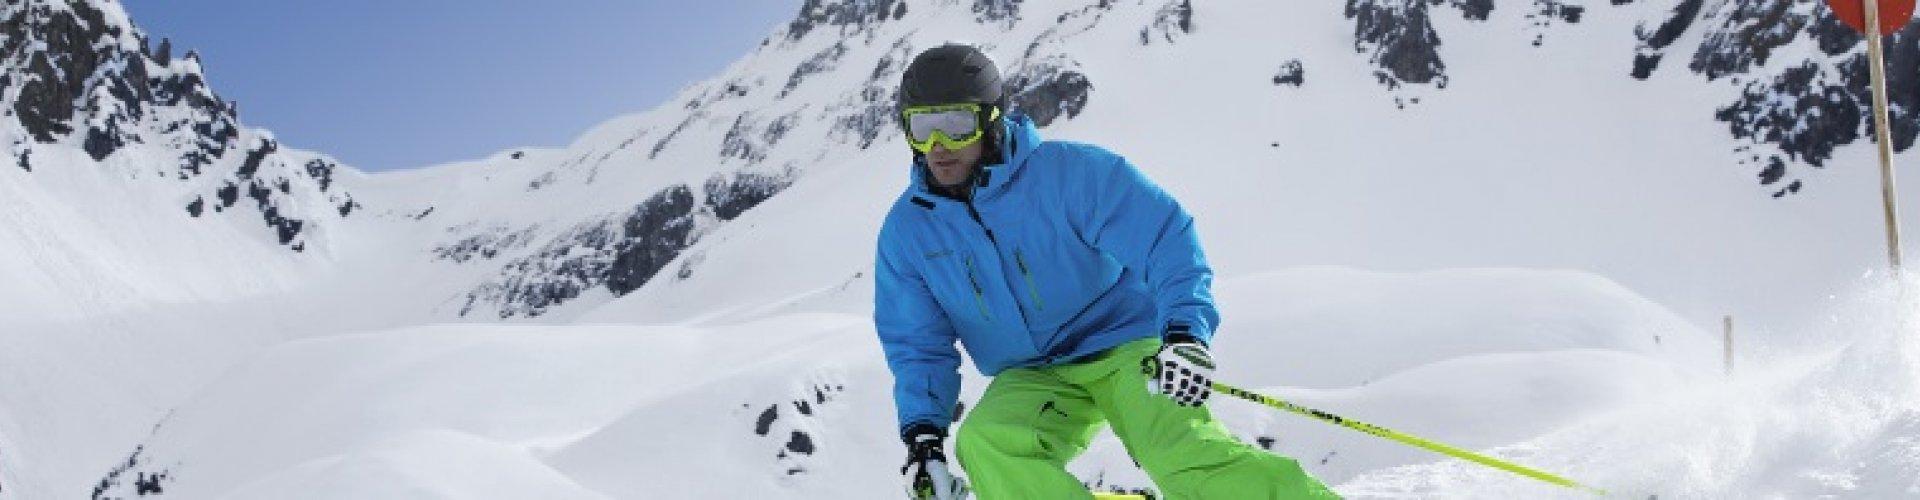 Skiregion Kaiserwinkl